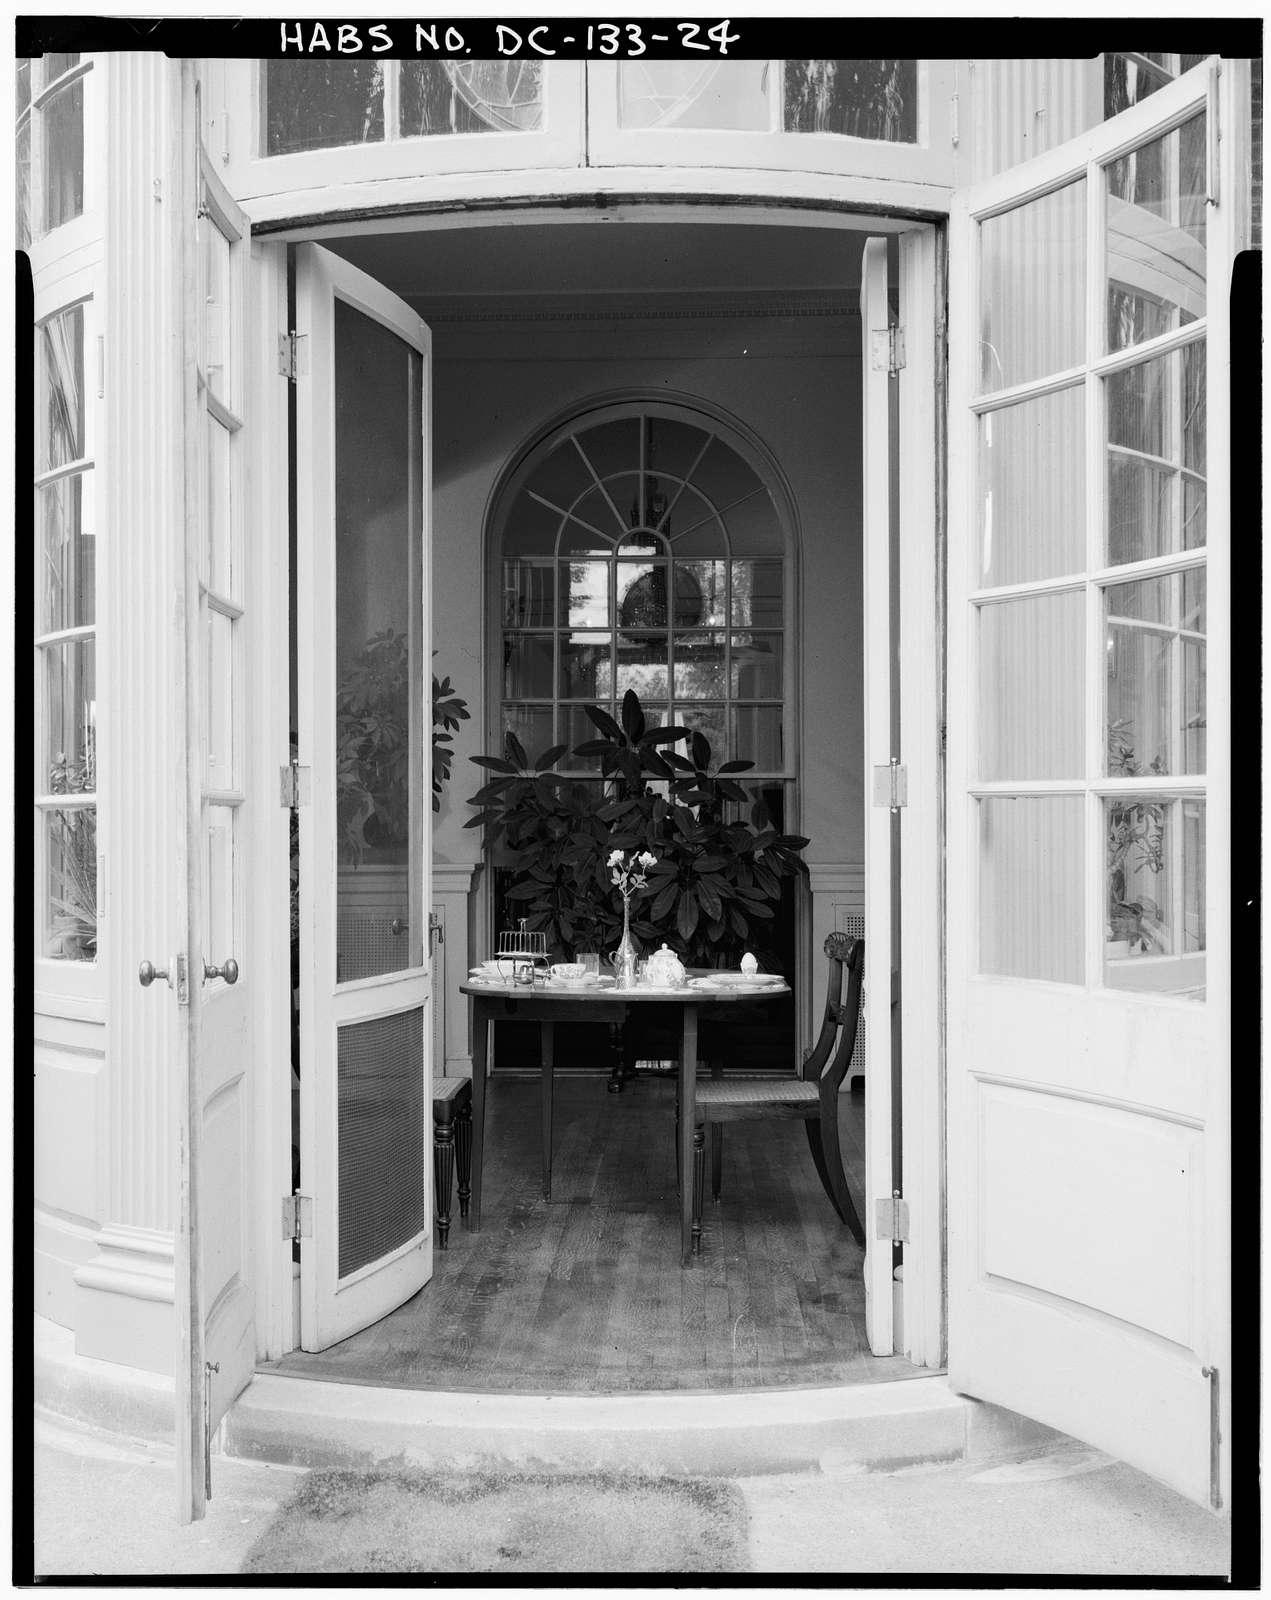 Woodrow Wilson House, 2340 South S Street, Northwest, Washington, District of Columbia, DC